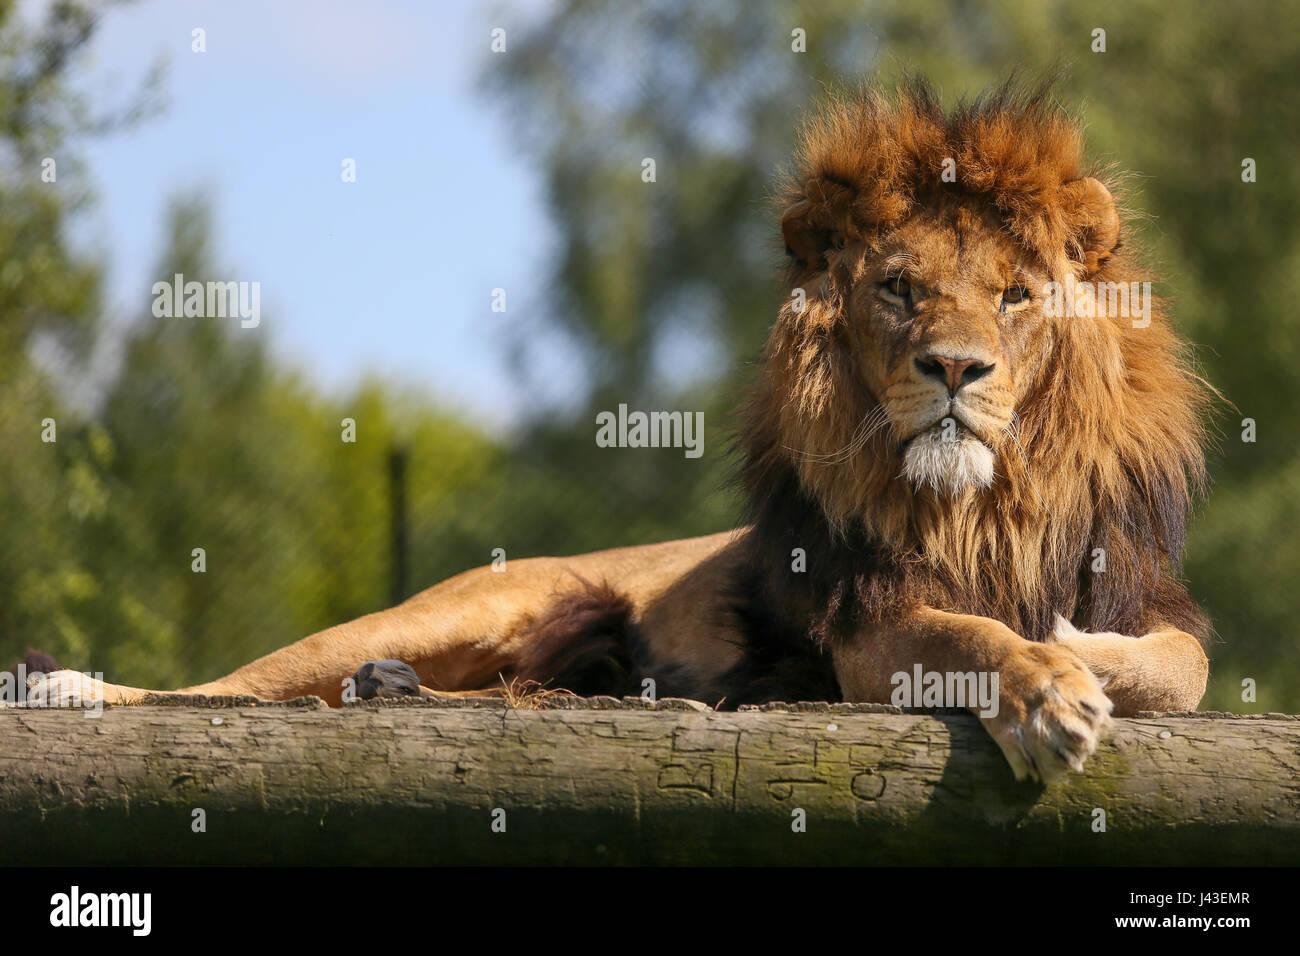 Lion at Knowsley Safari, Prescot, United Kingdom - Stock Image